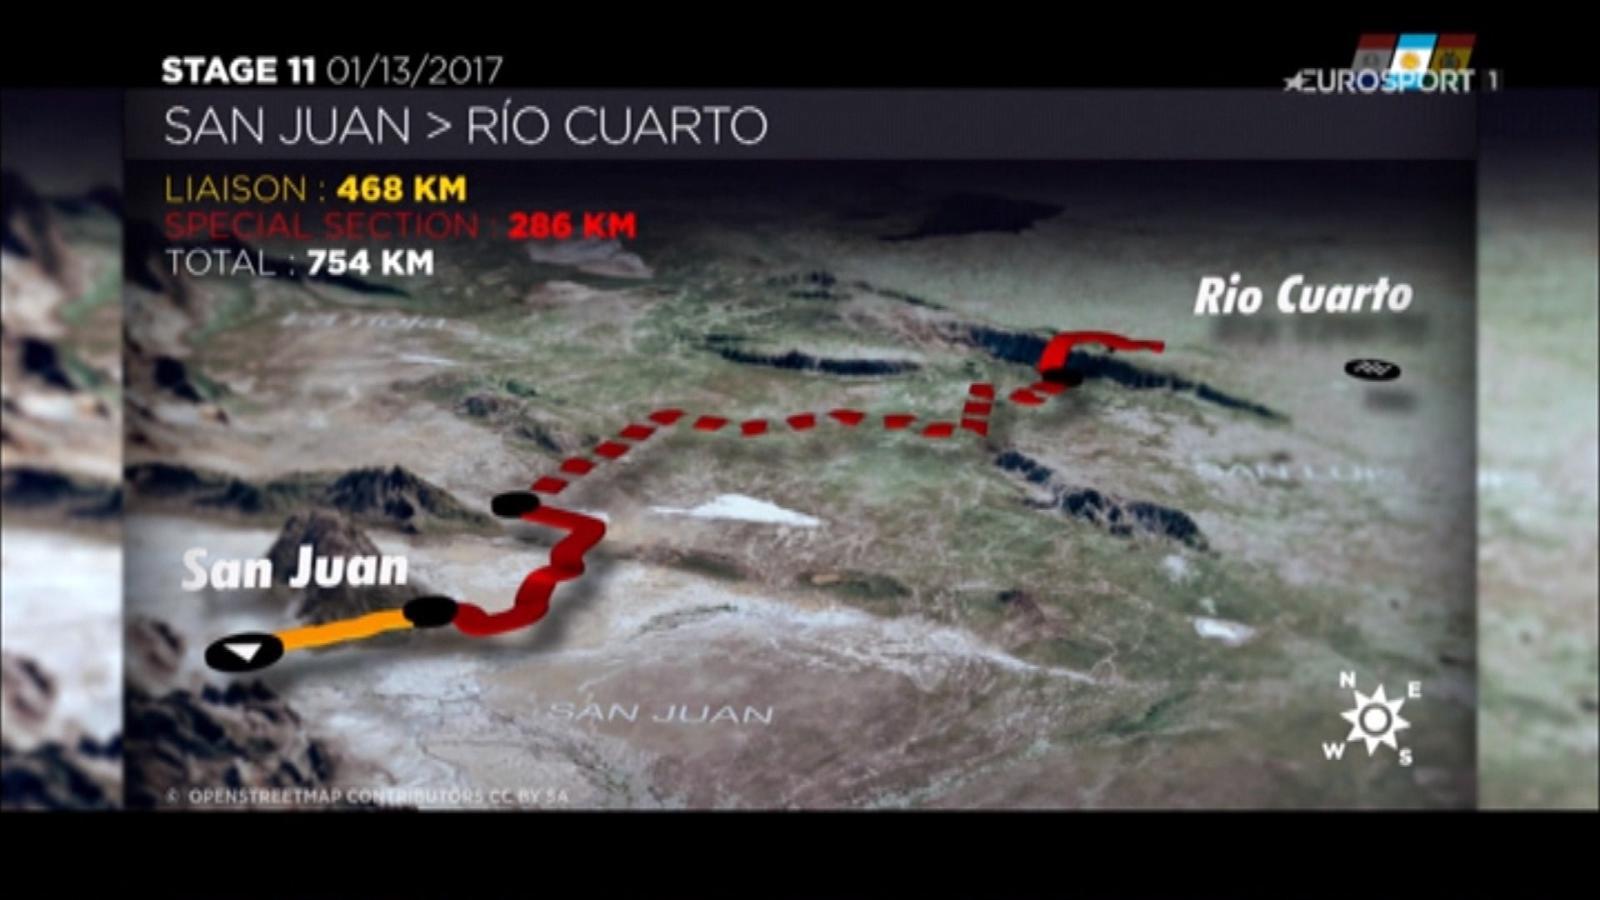 VIDEO - Dakar 2017: Vorschau 11. Etappe nach Rio Cuarto - Dakar ...